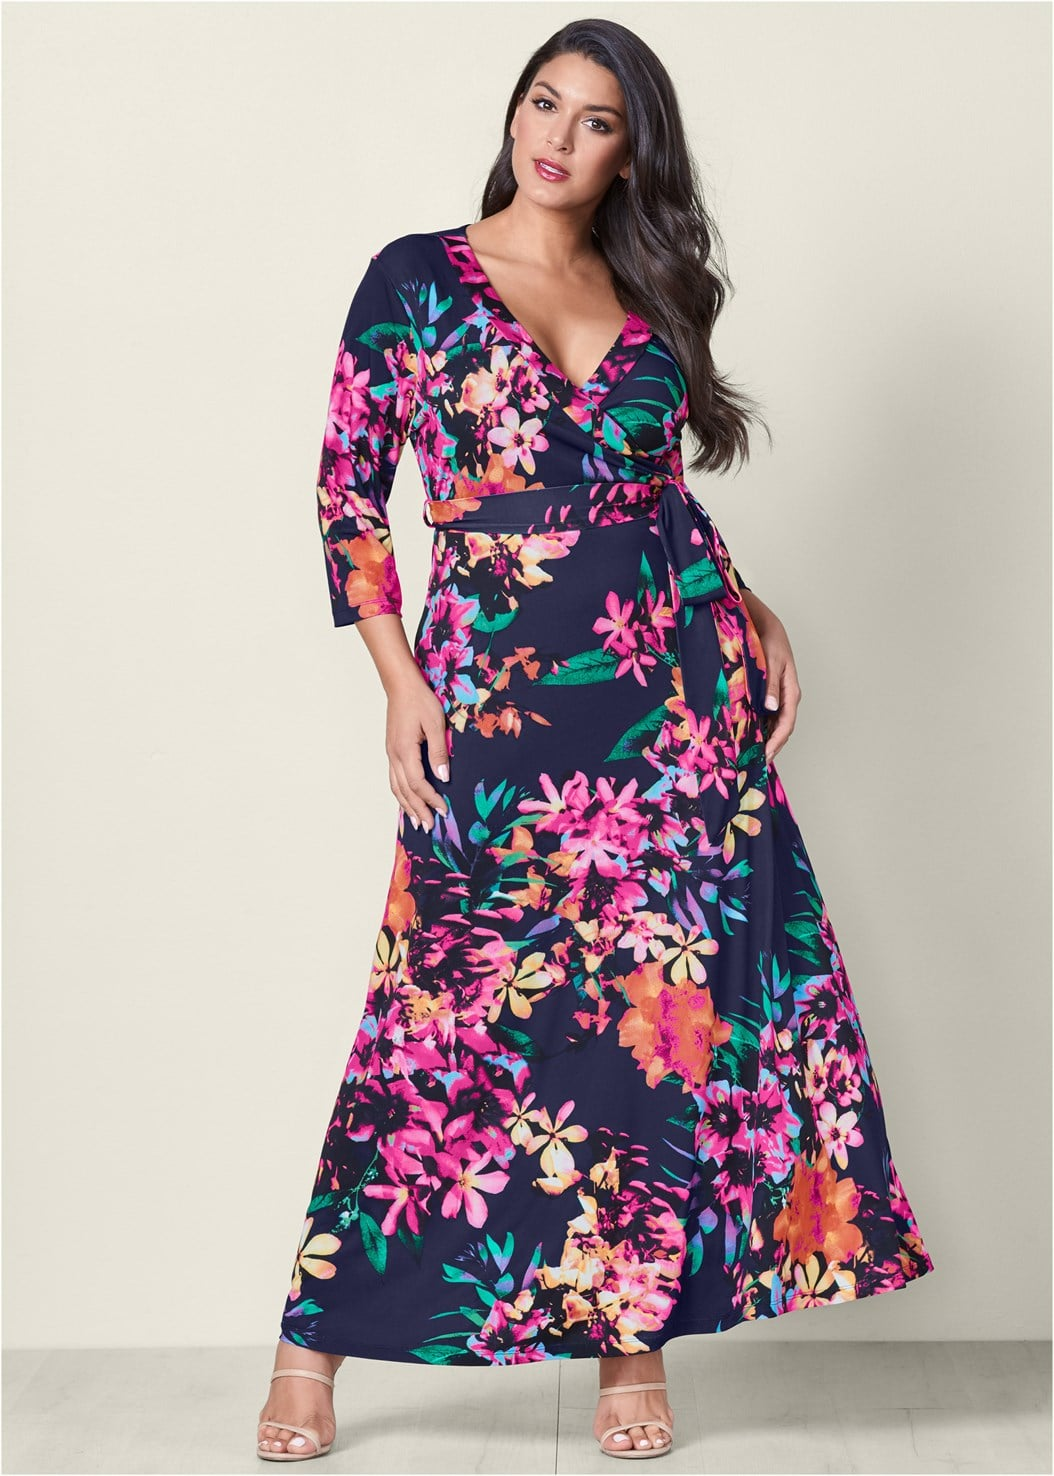 Venus Plus Size Floral Print Maxi Dress | Hailey Baldwin\'s ...